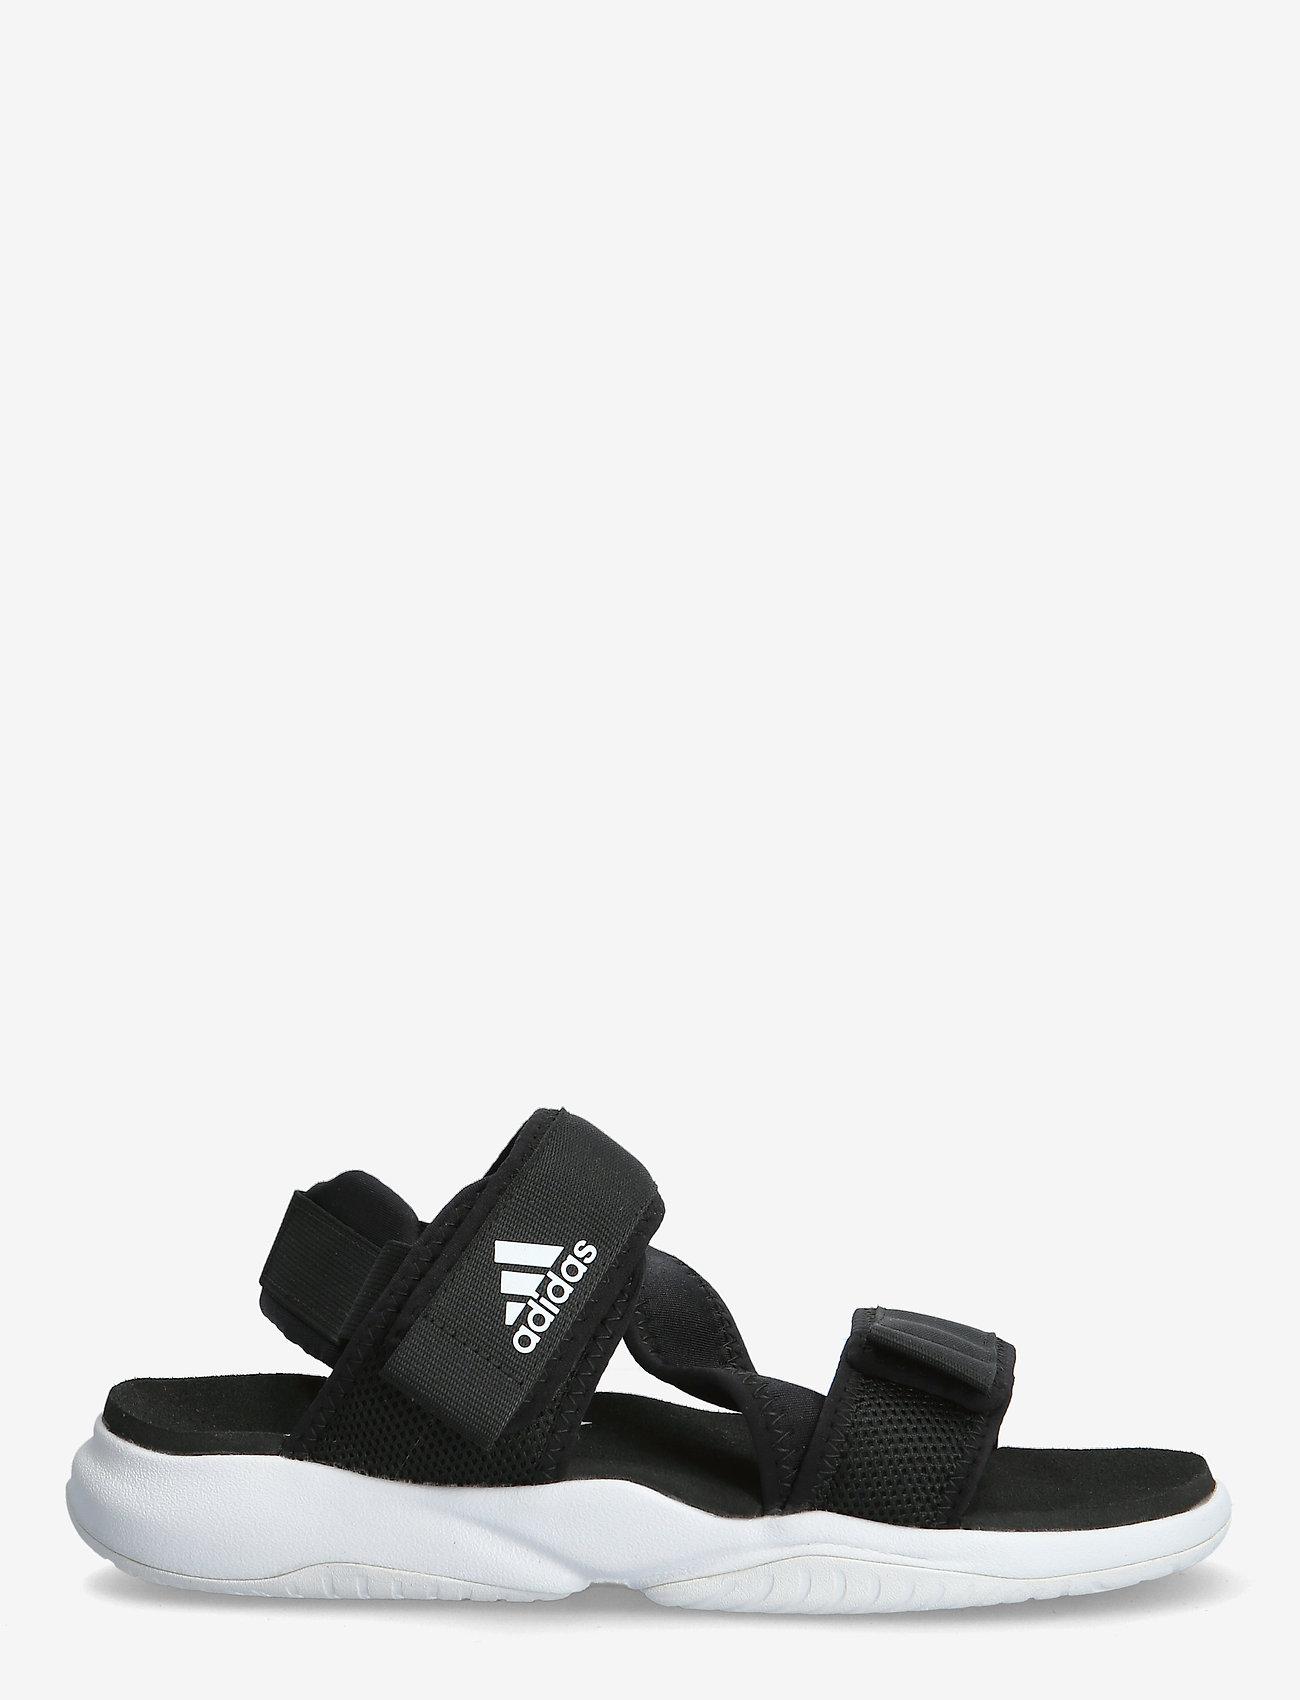 adidas Performance - Terrex Sumra Sandals W - hiking sandals - cblack/ftwwht/cblack - 1